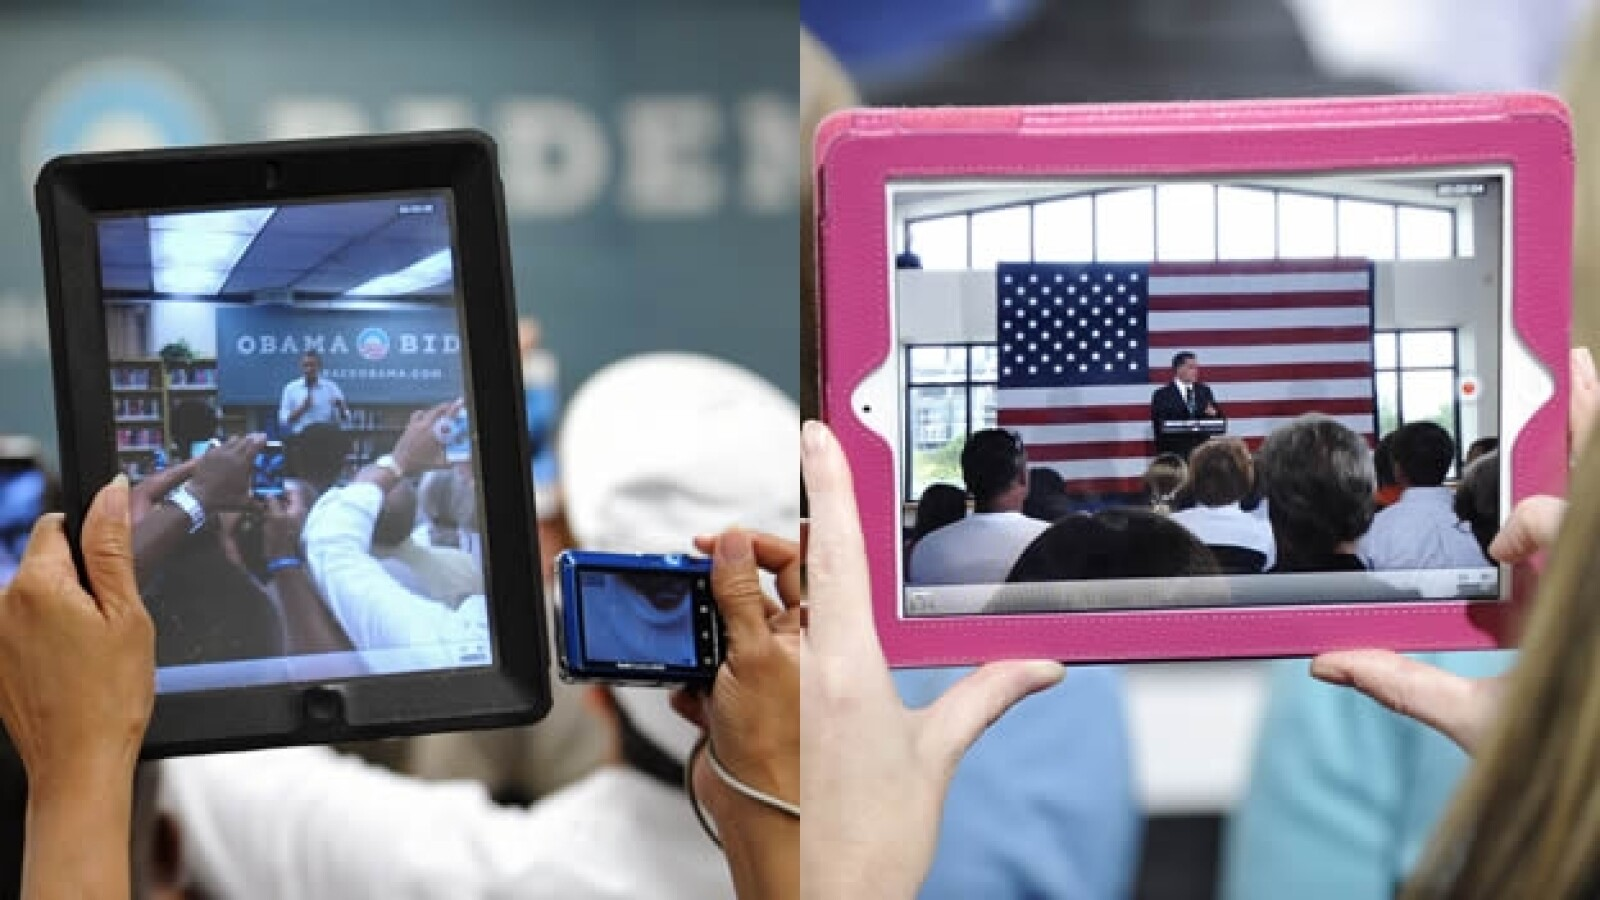 Obama Romney iPad